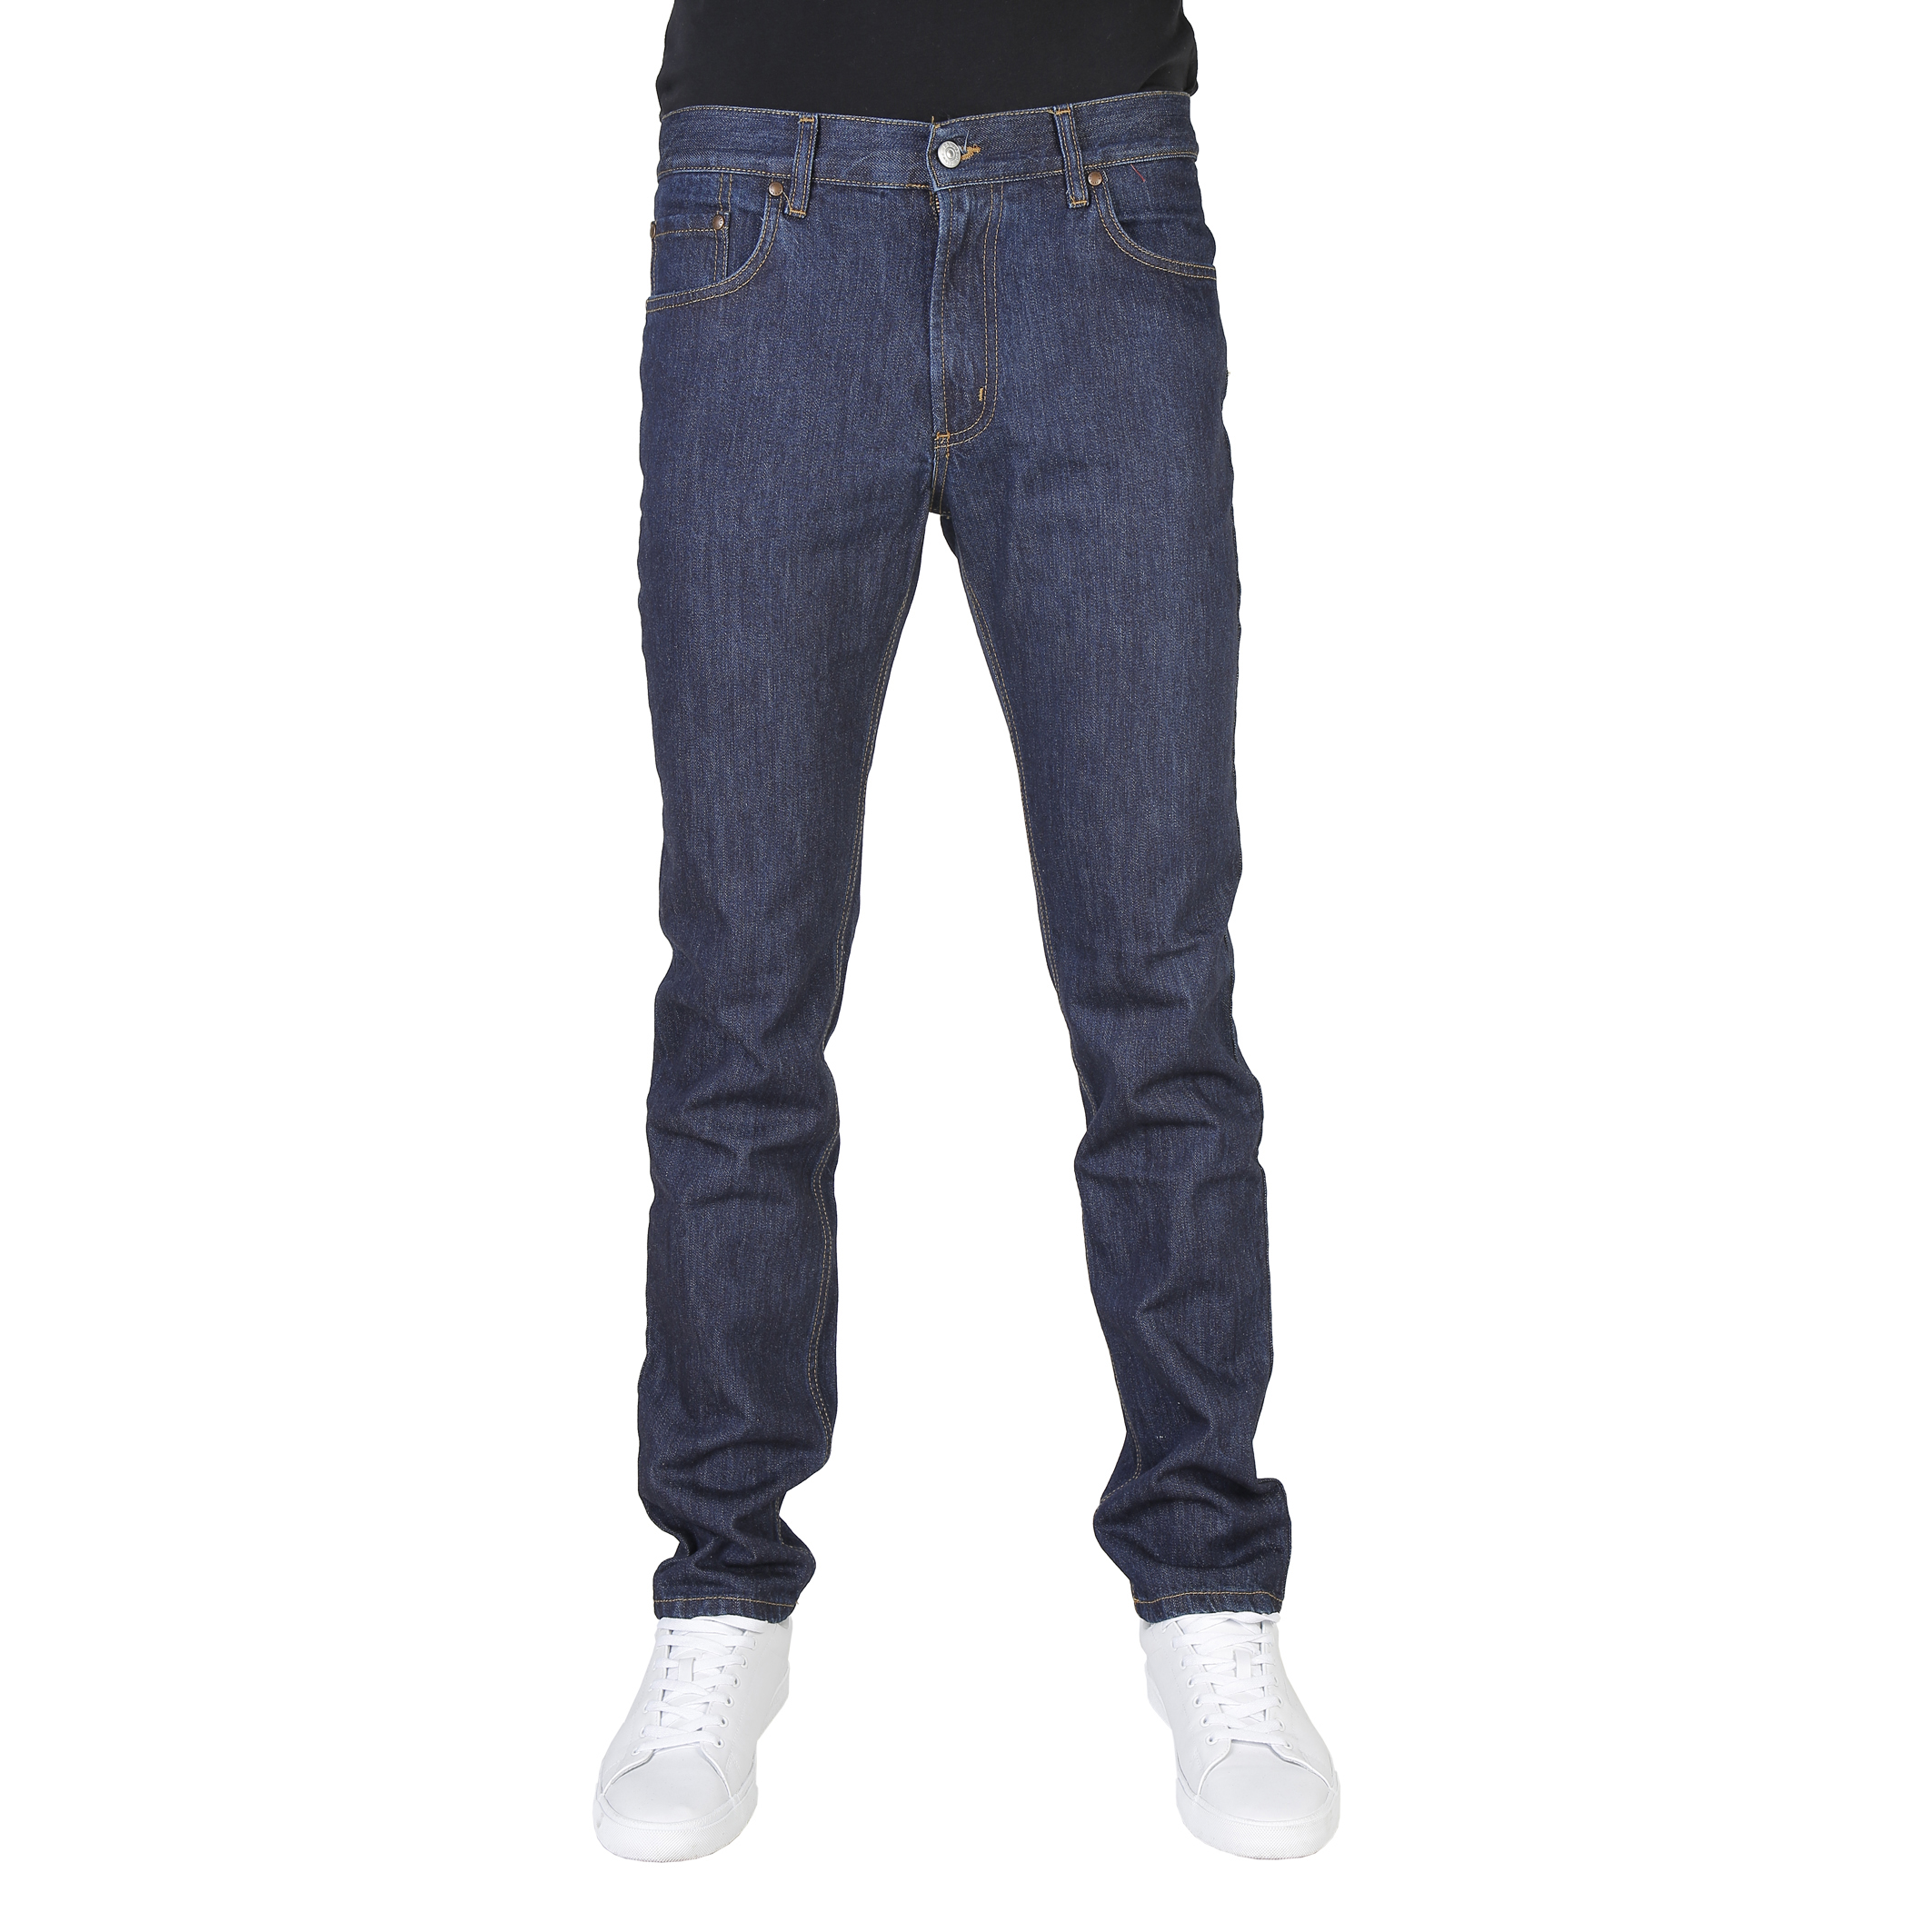 Jeans Carrera Jeans 000700_01021 Uomo Blu 76353